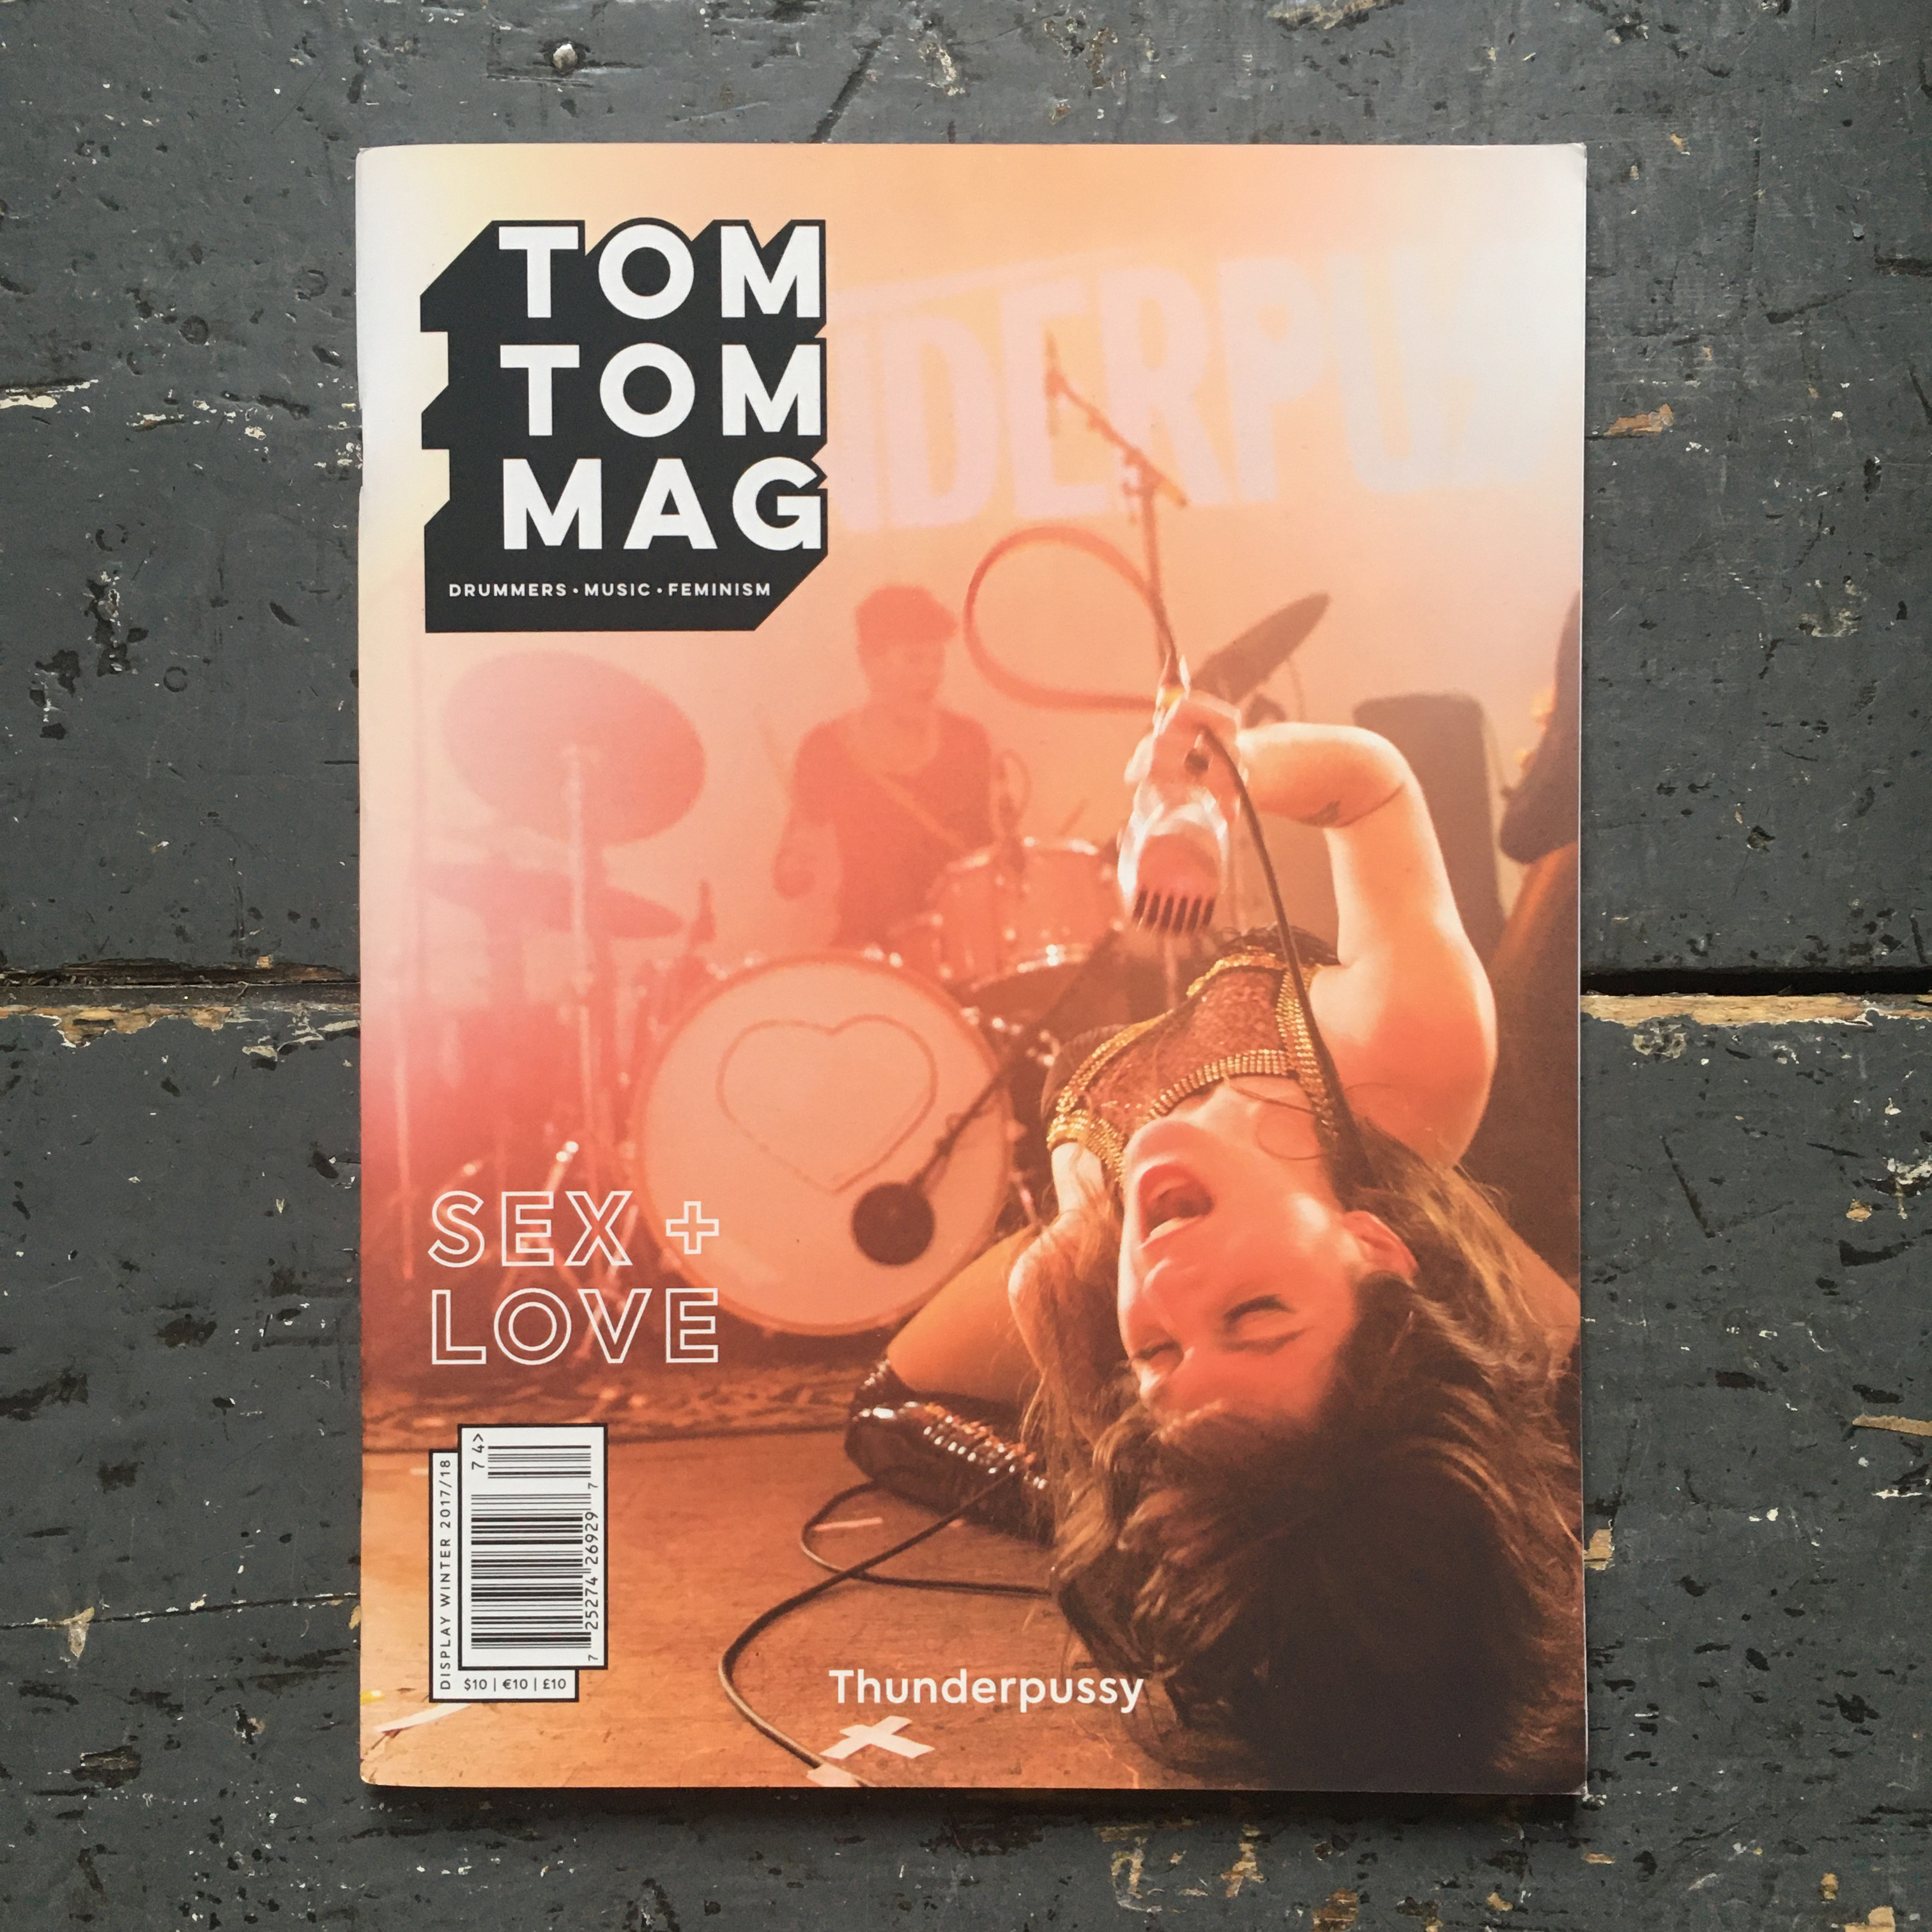 TOM TOM MAG - drummers / music / feminist magazine